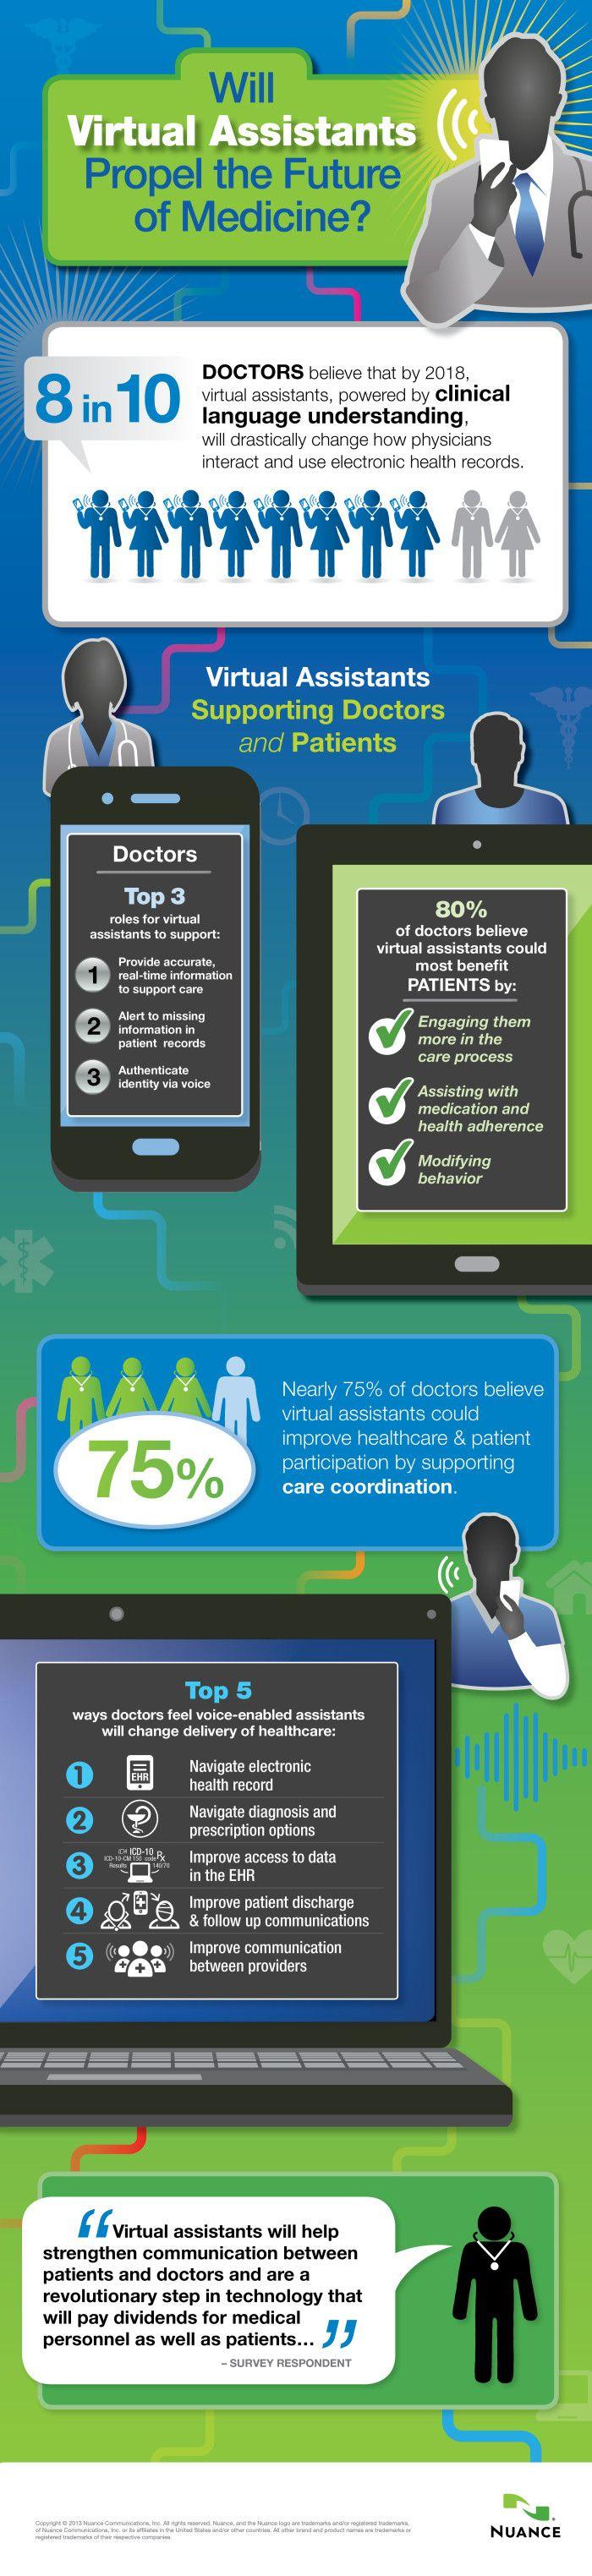 Virtual assistants to change medicine